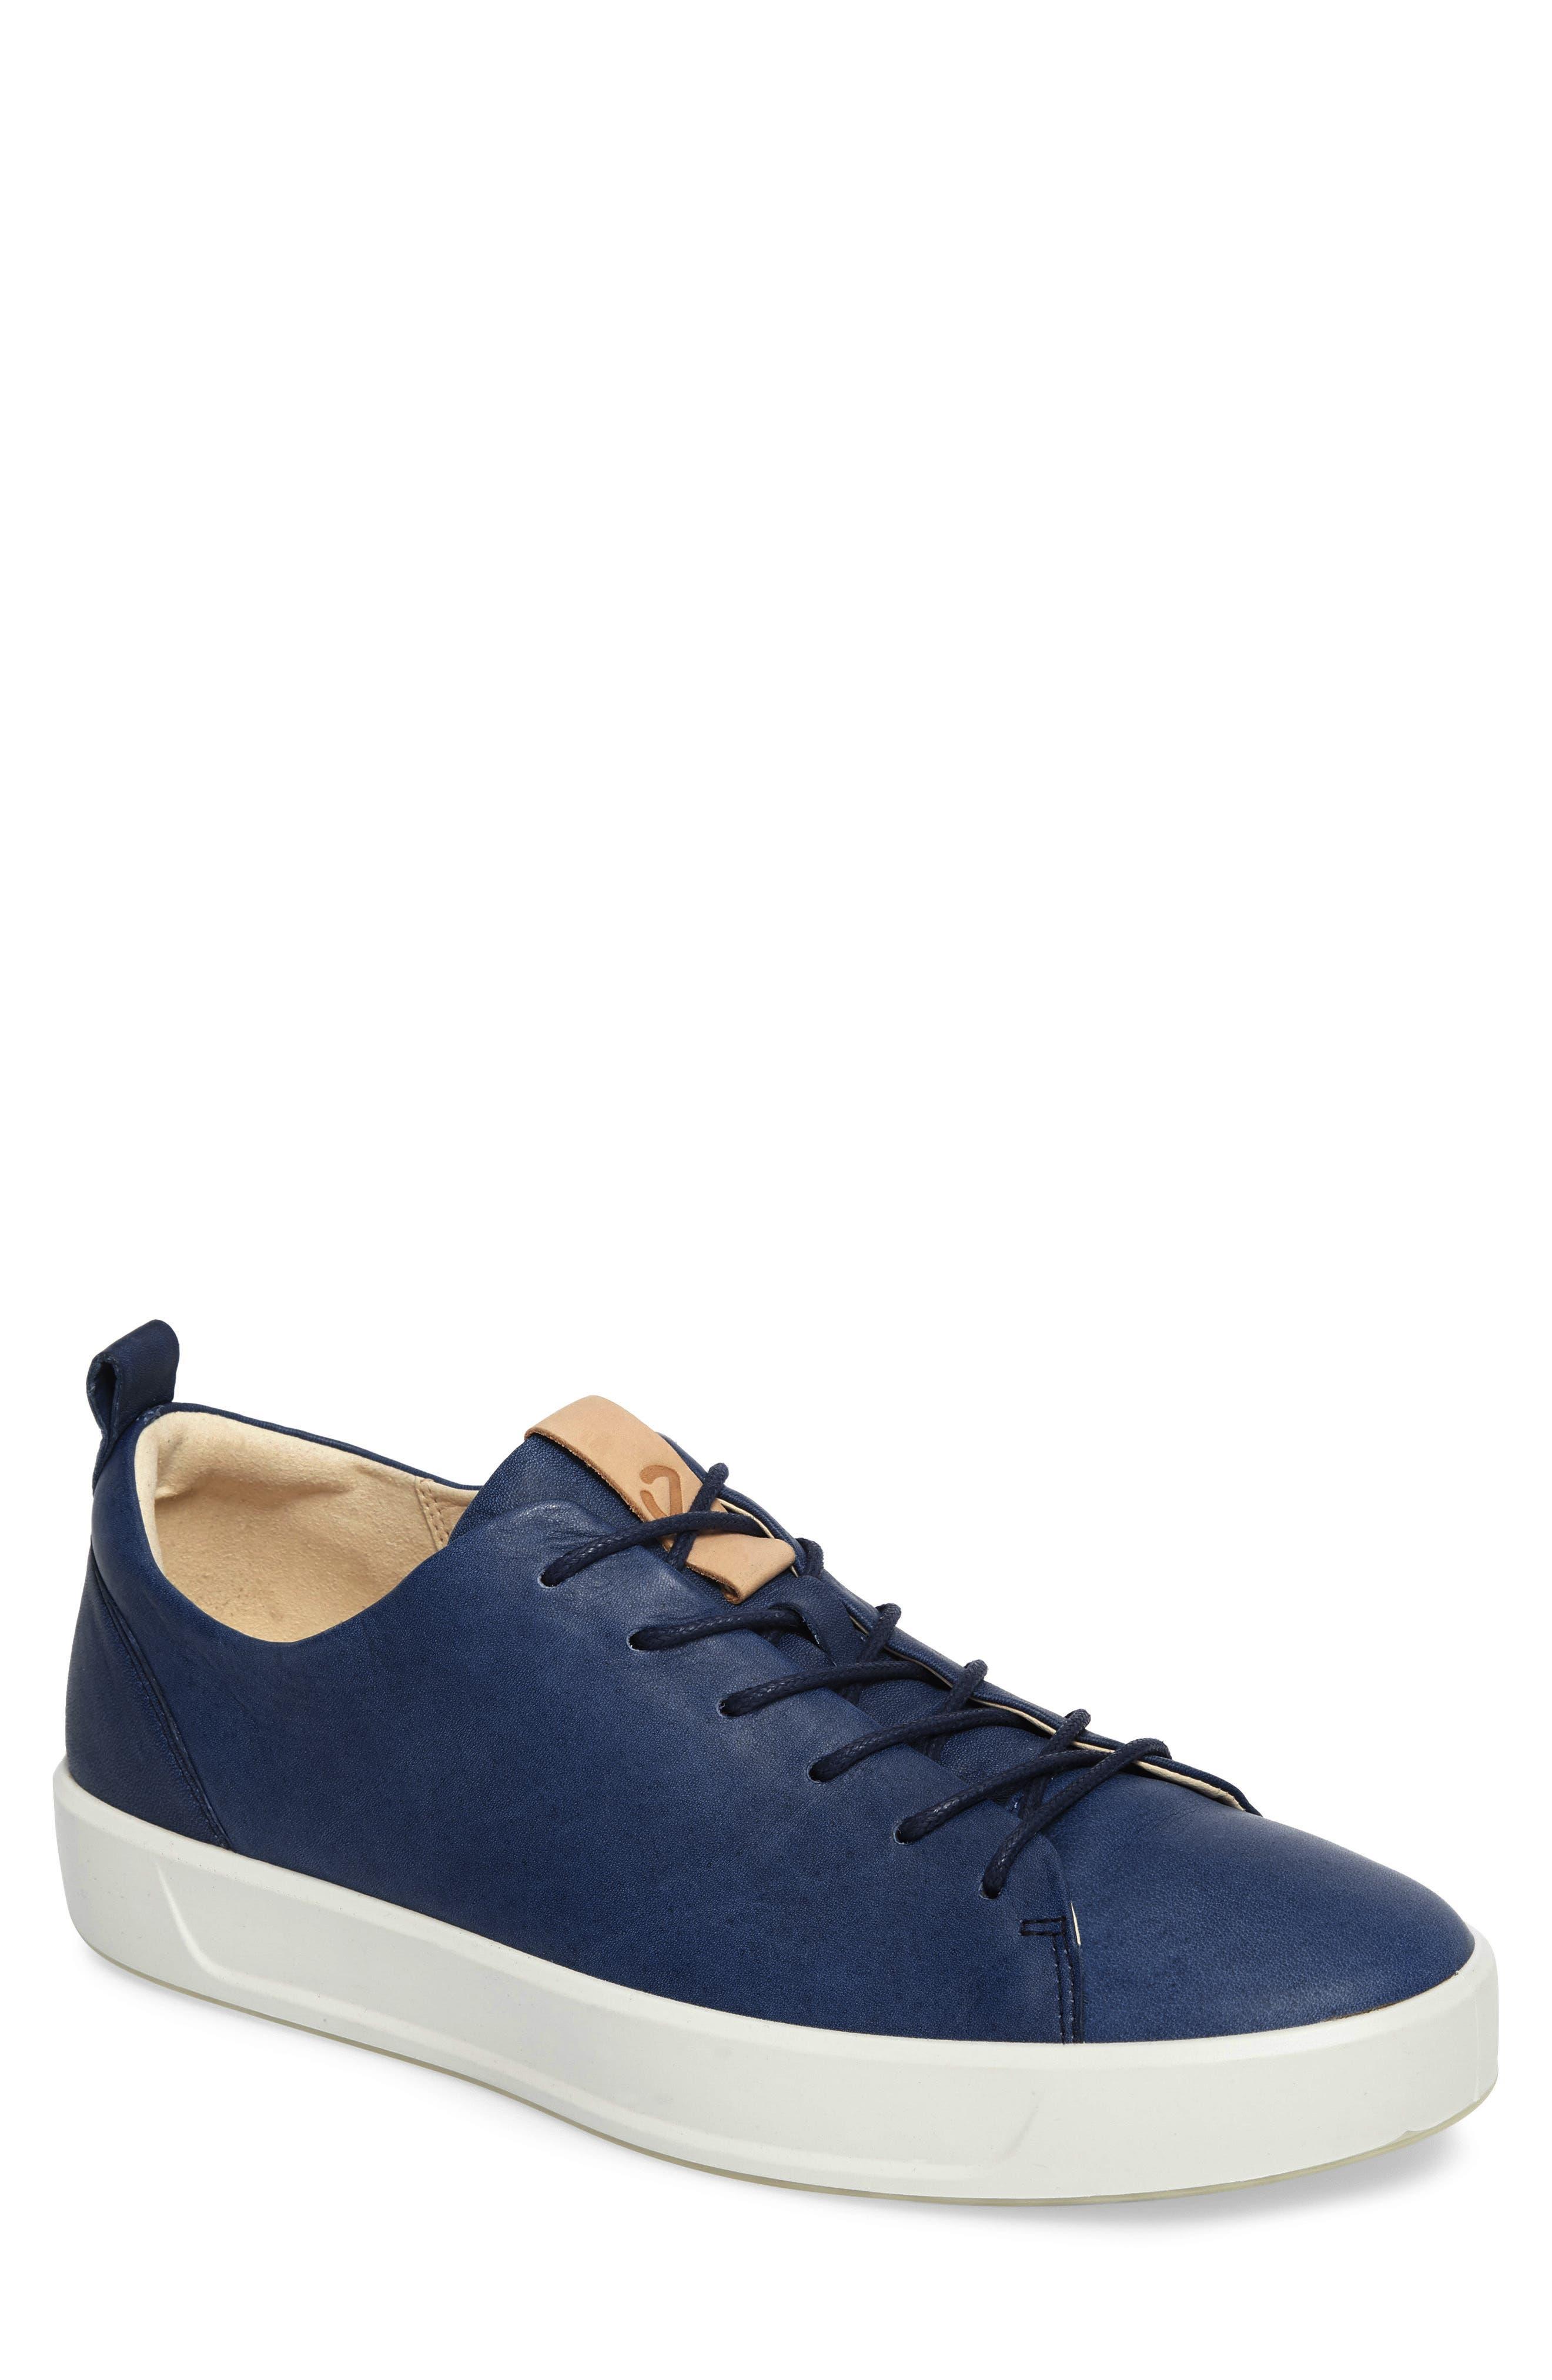 Soft 8 Sneaker,                             Main thumbnail 1, color,                             INDIGO 7 LEATHER